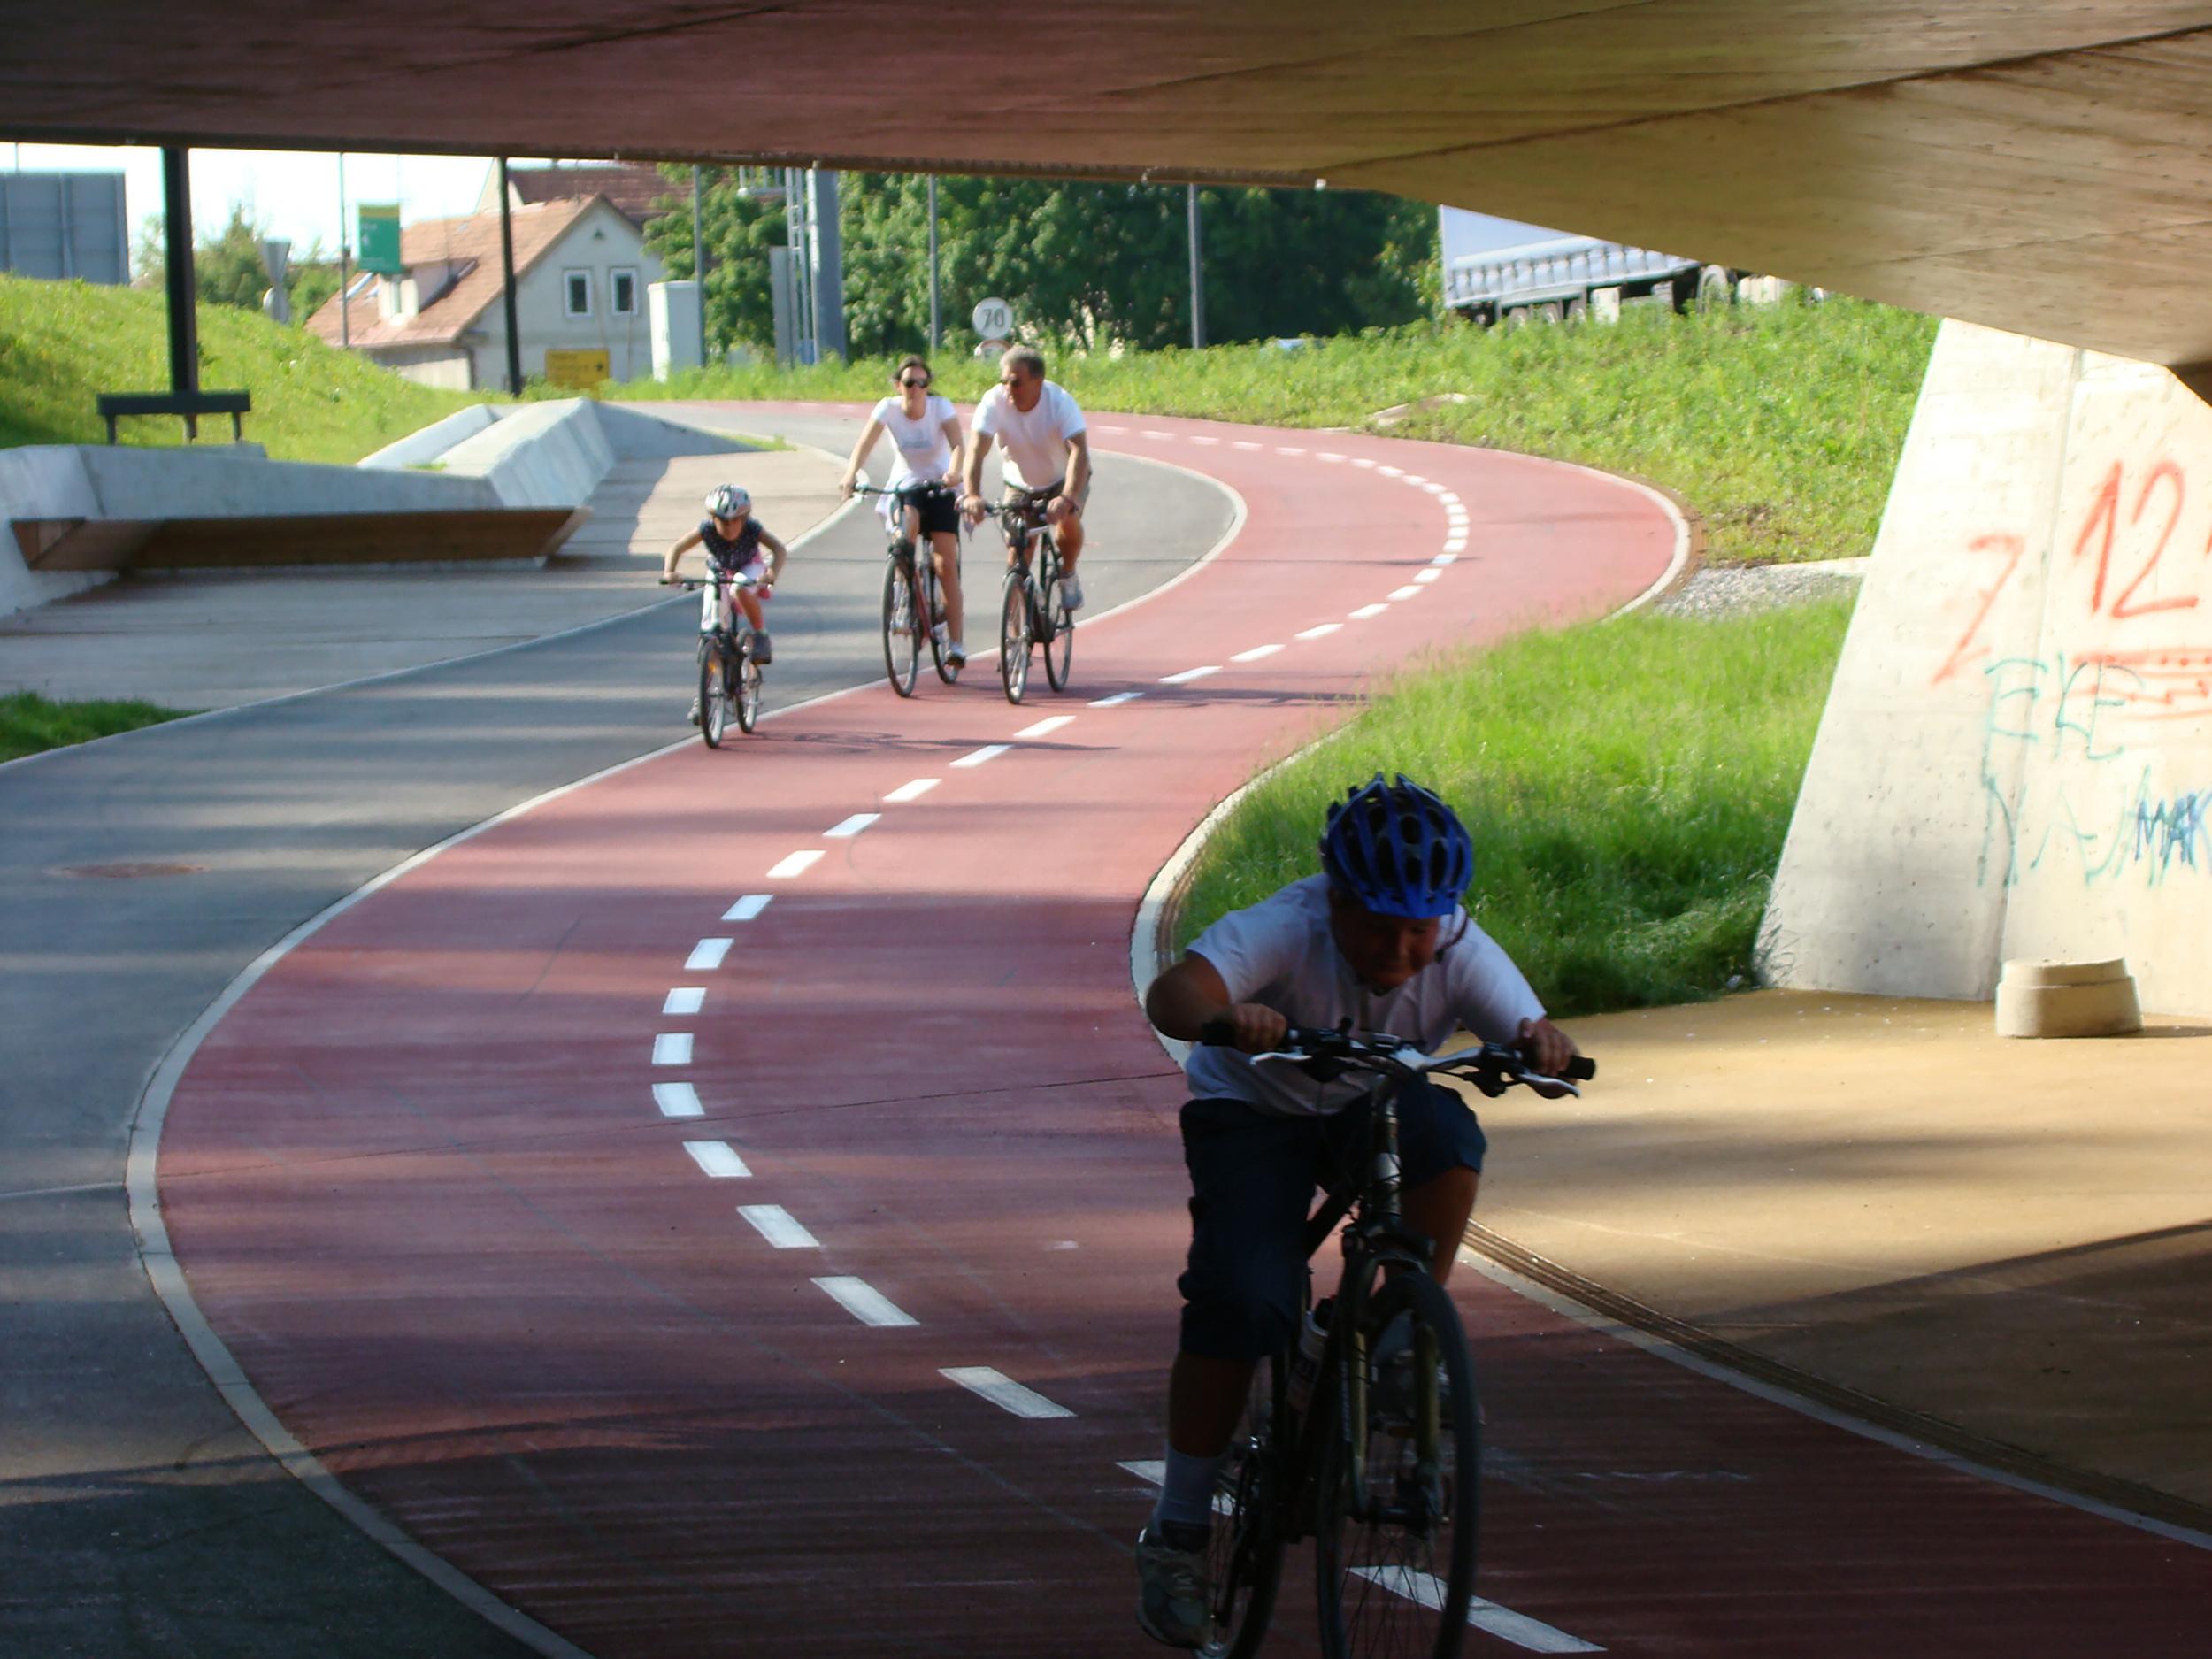 bruto ac park šentvid ljubljana most tunel underpass podhod